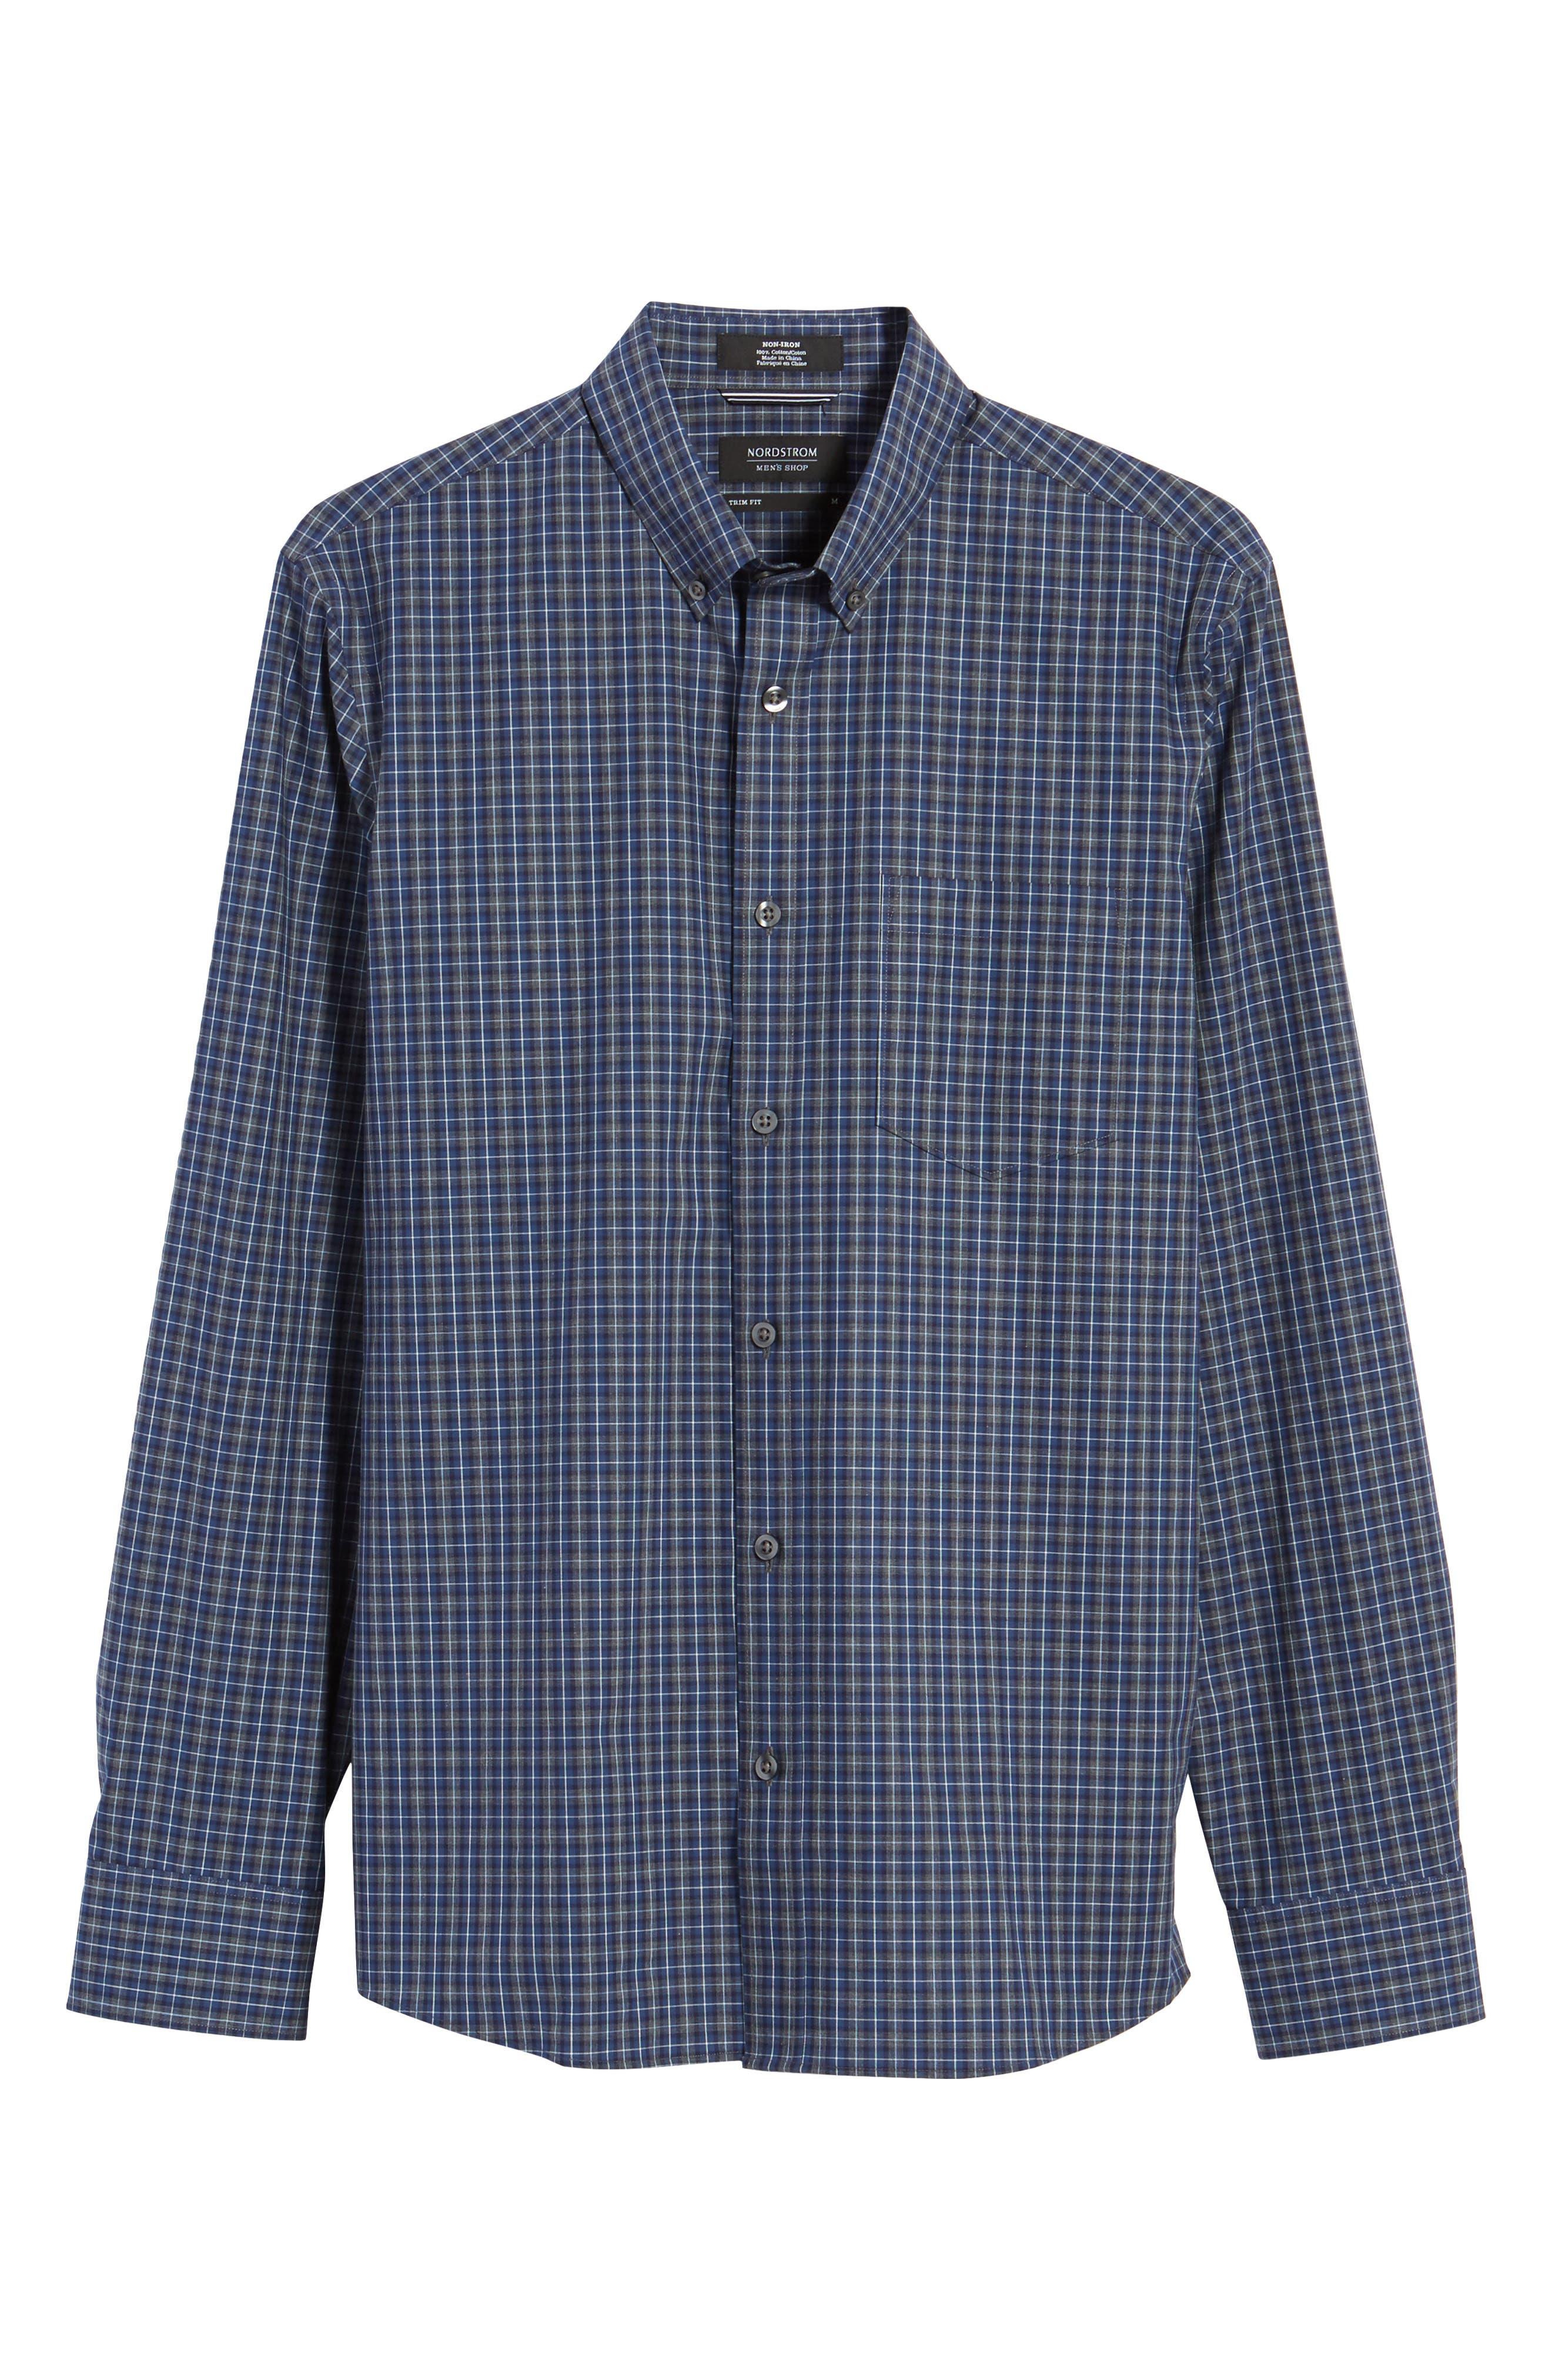 Trim Fit Check Sport Shirt,                             Alternate thumbnail 6, color,                             Navy Peacoat Grey Check